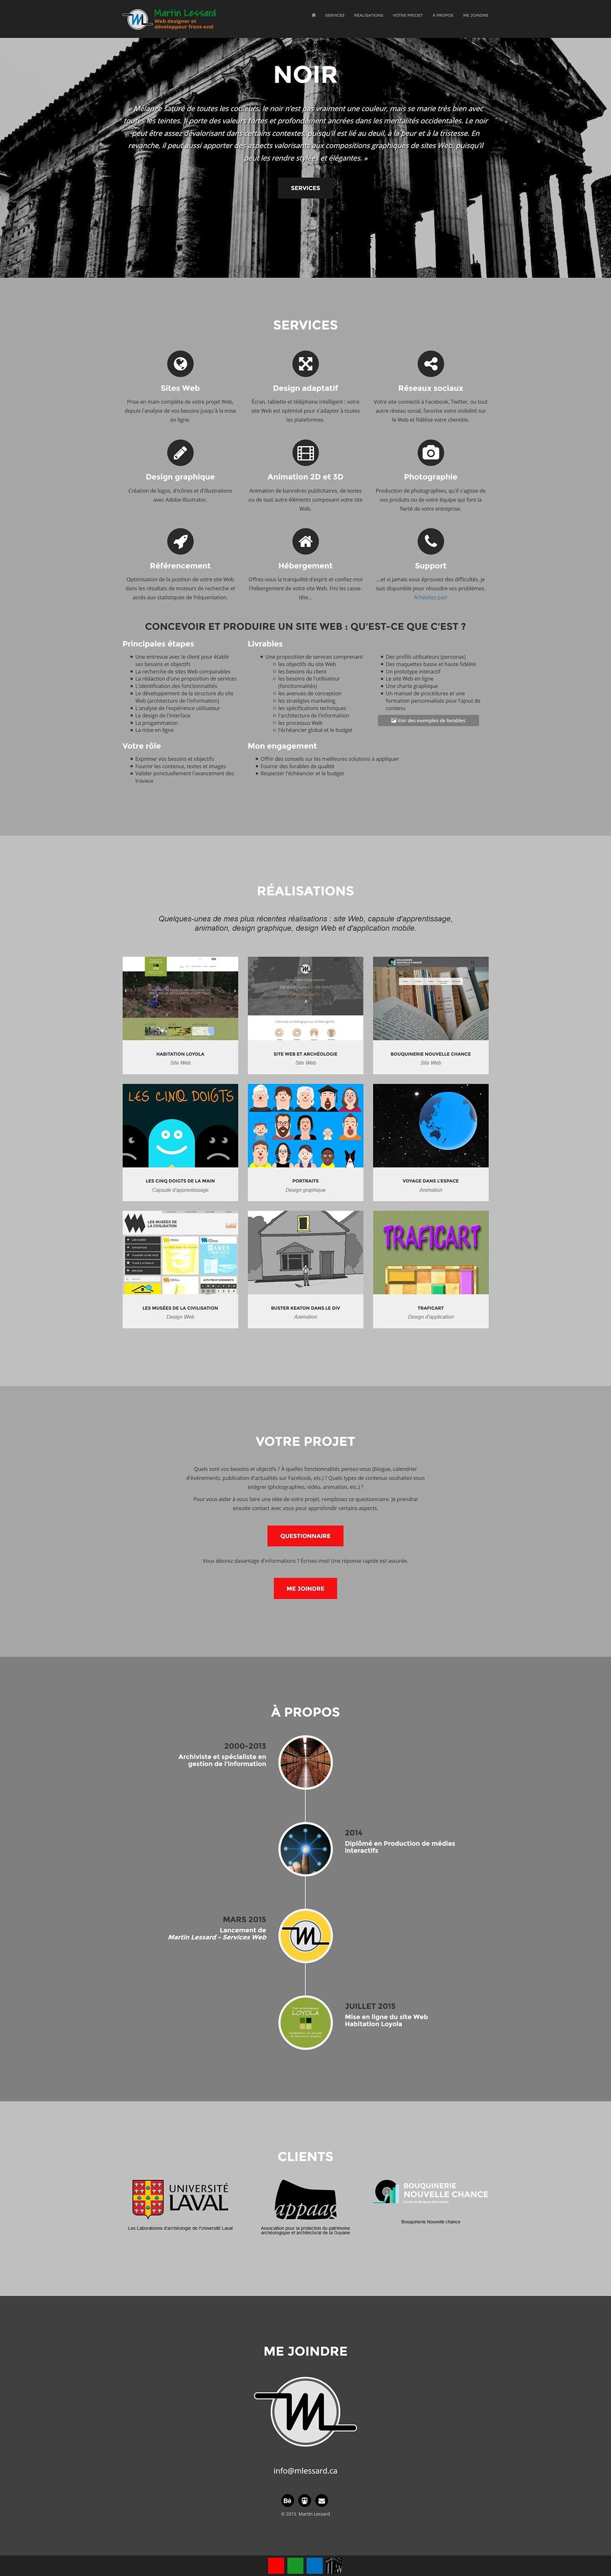 site web design html5 css3 tweeter bootstrap